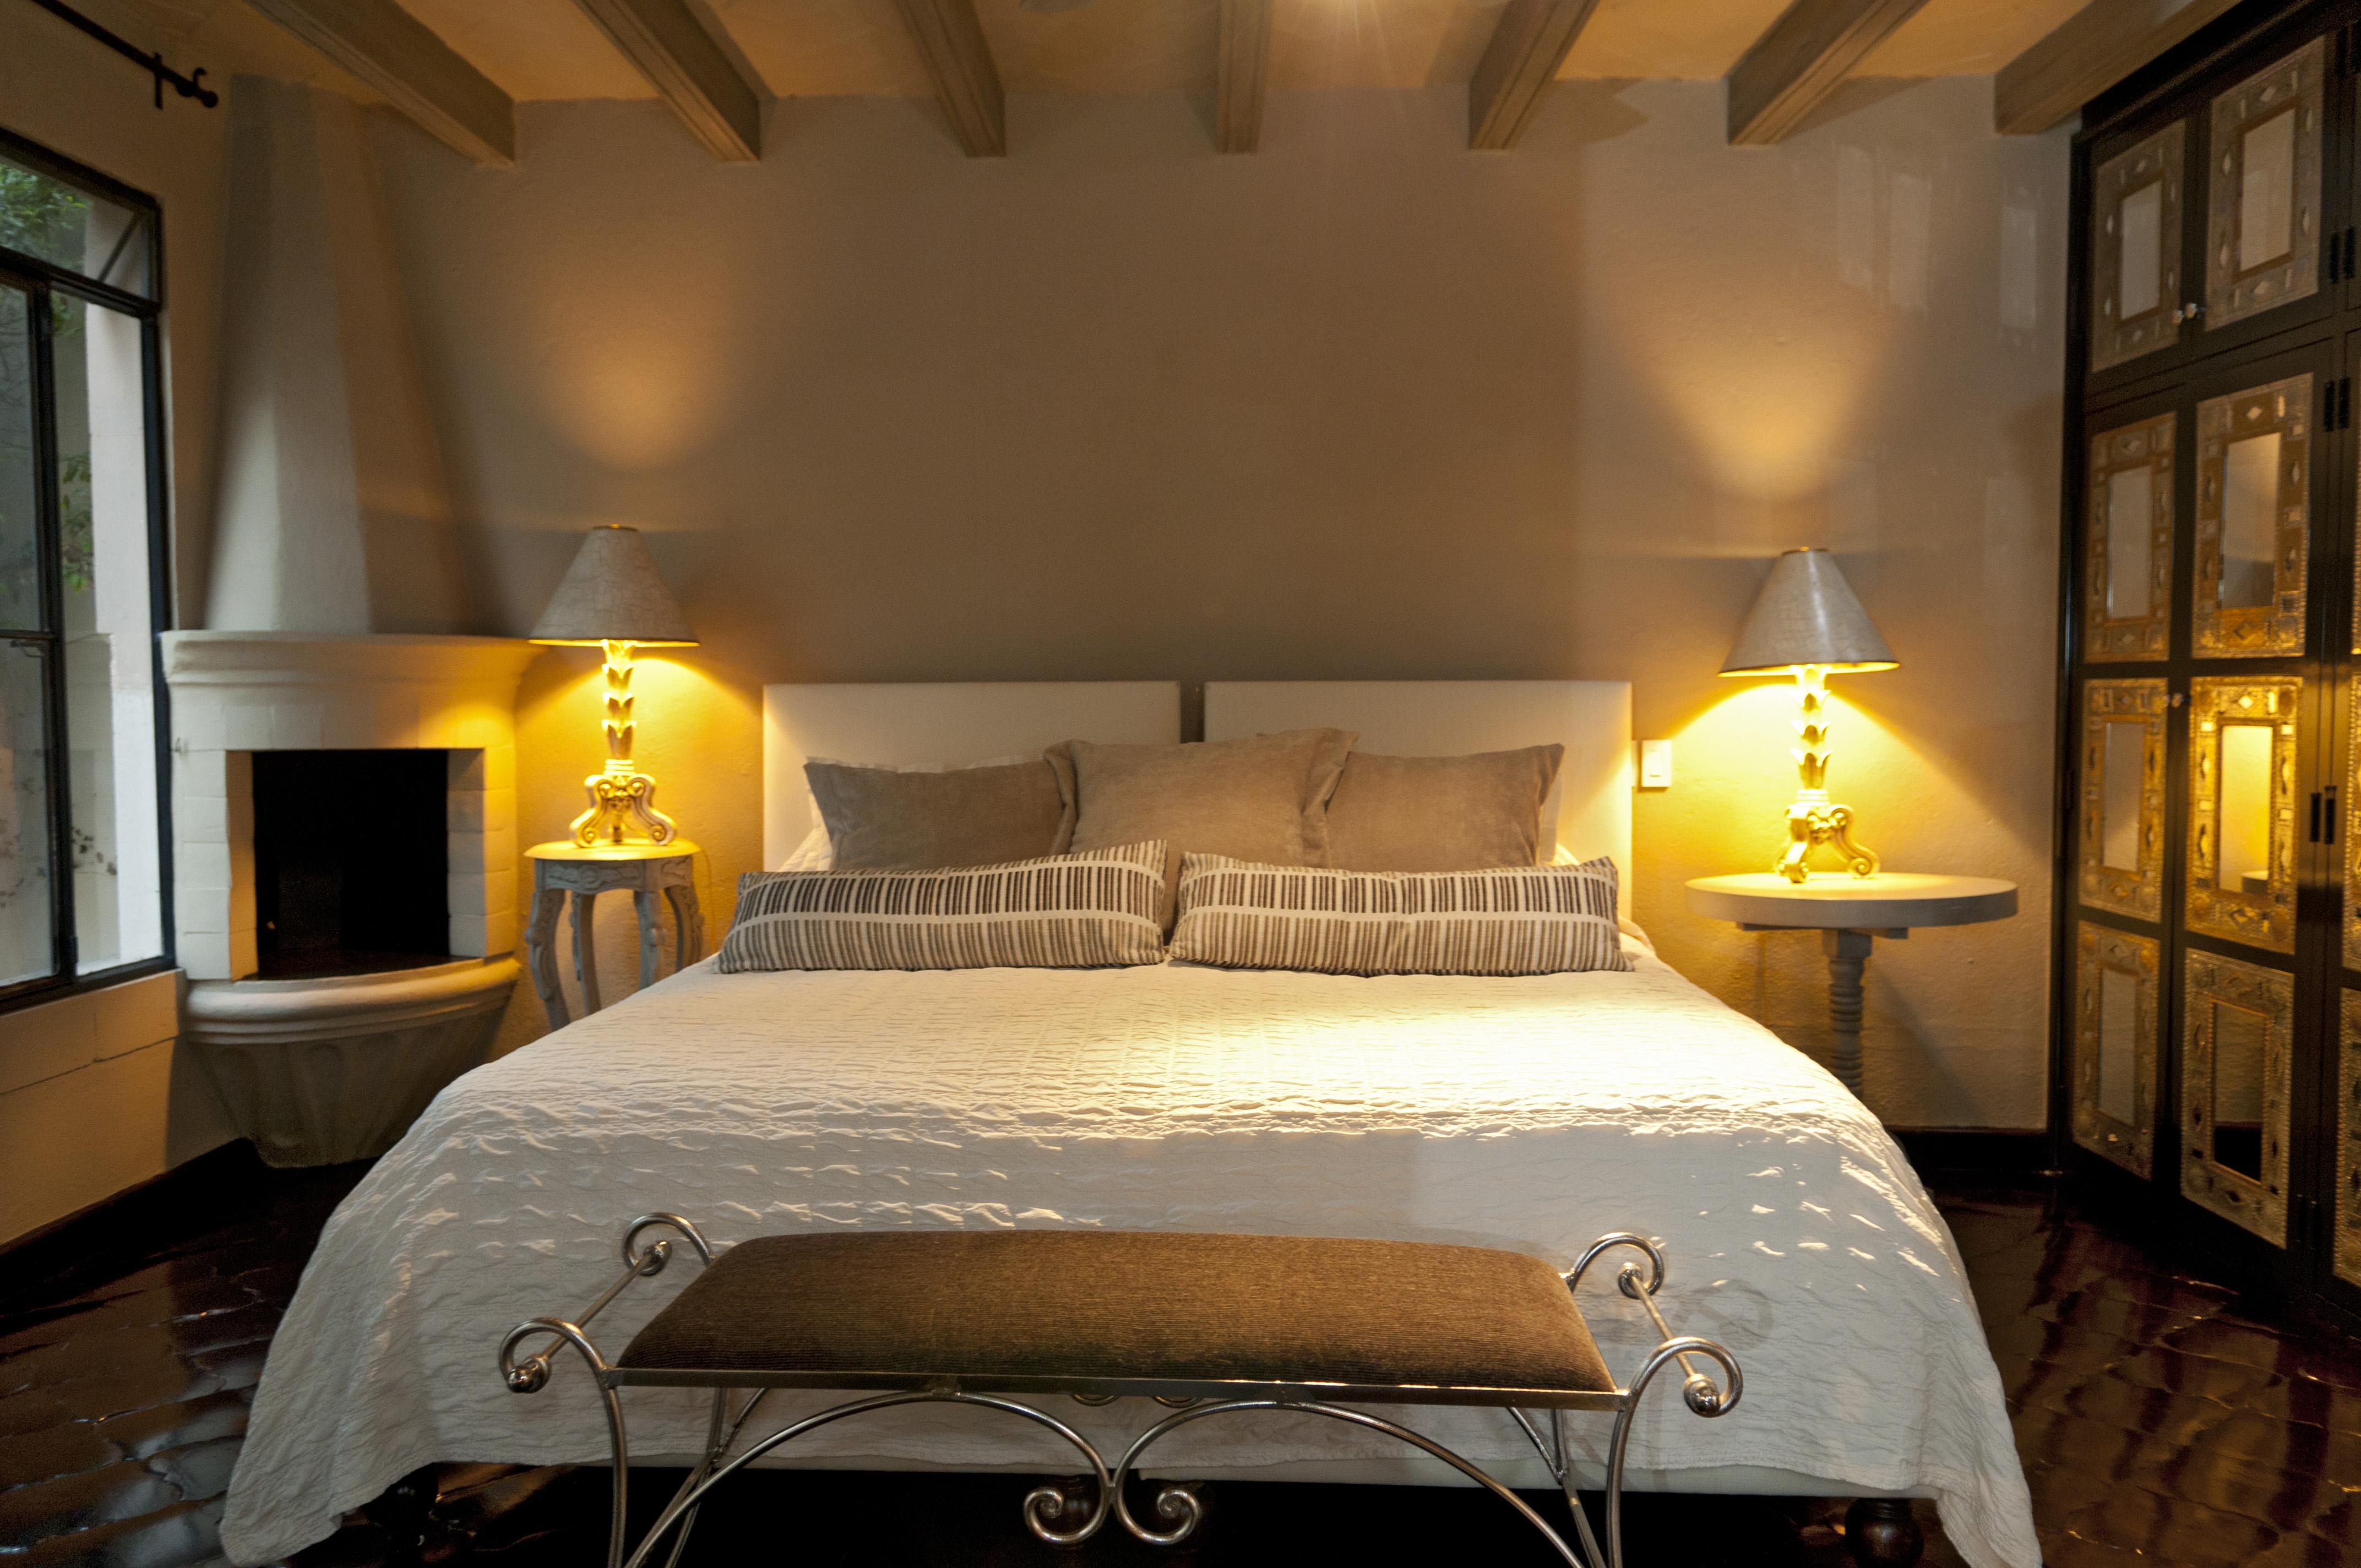 Casa Alegria bedroom 2 2nd floor king